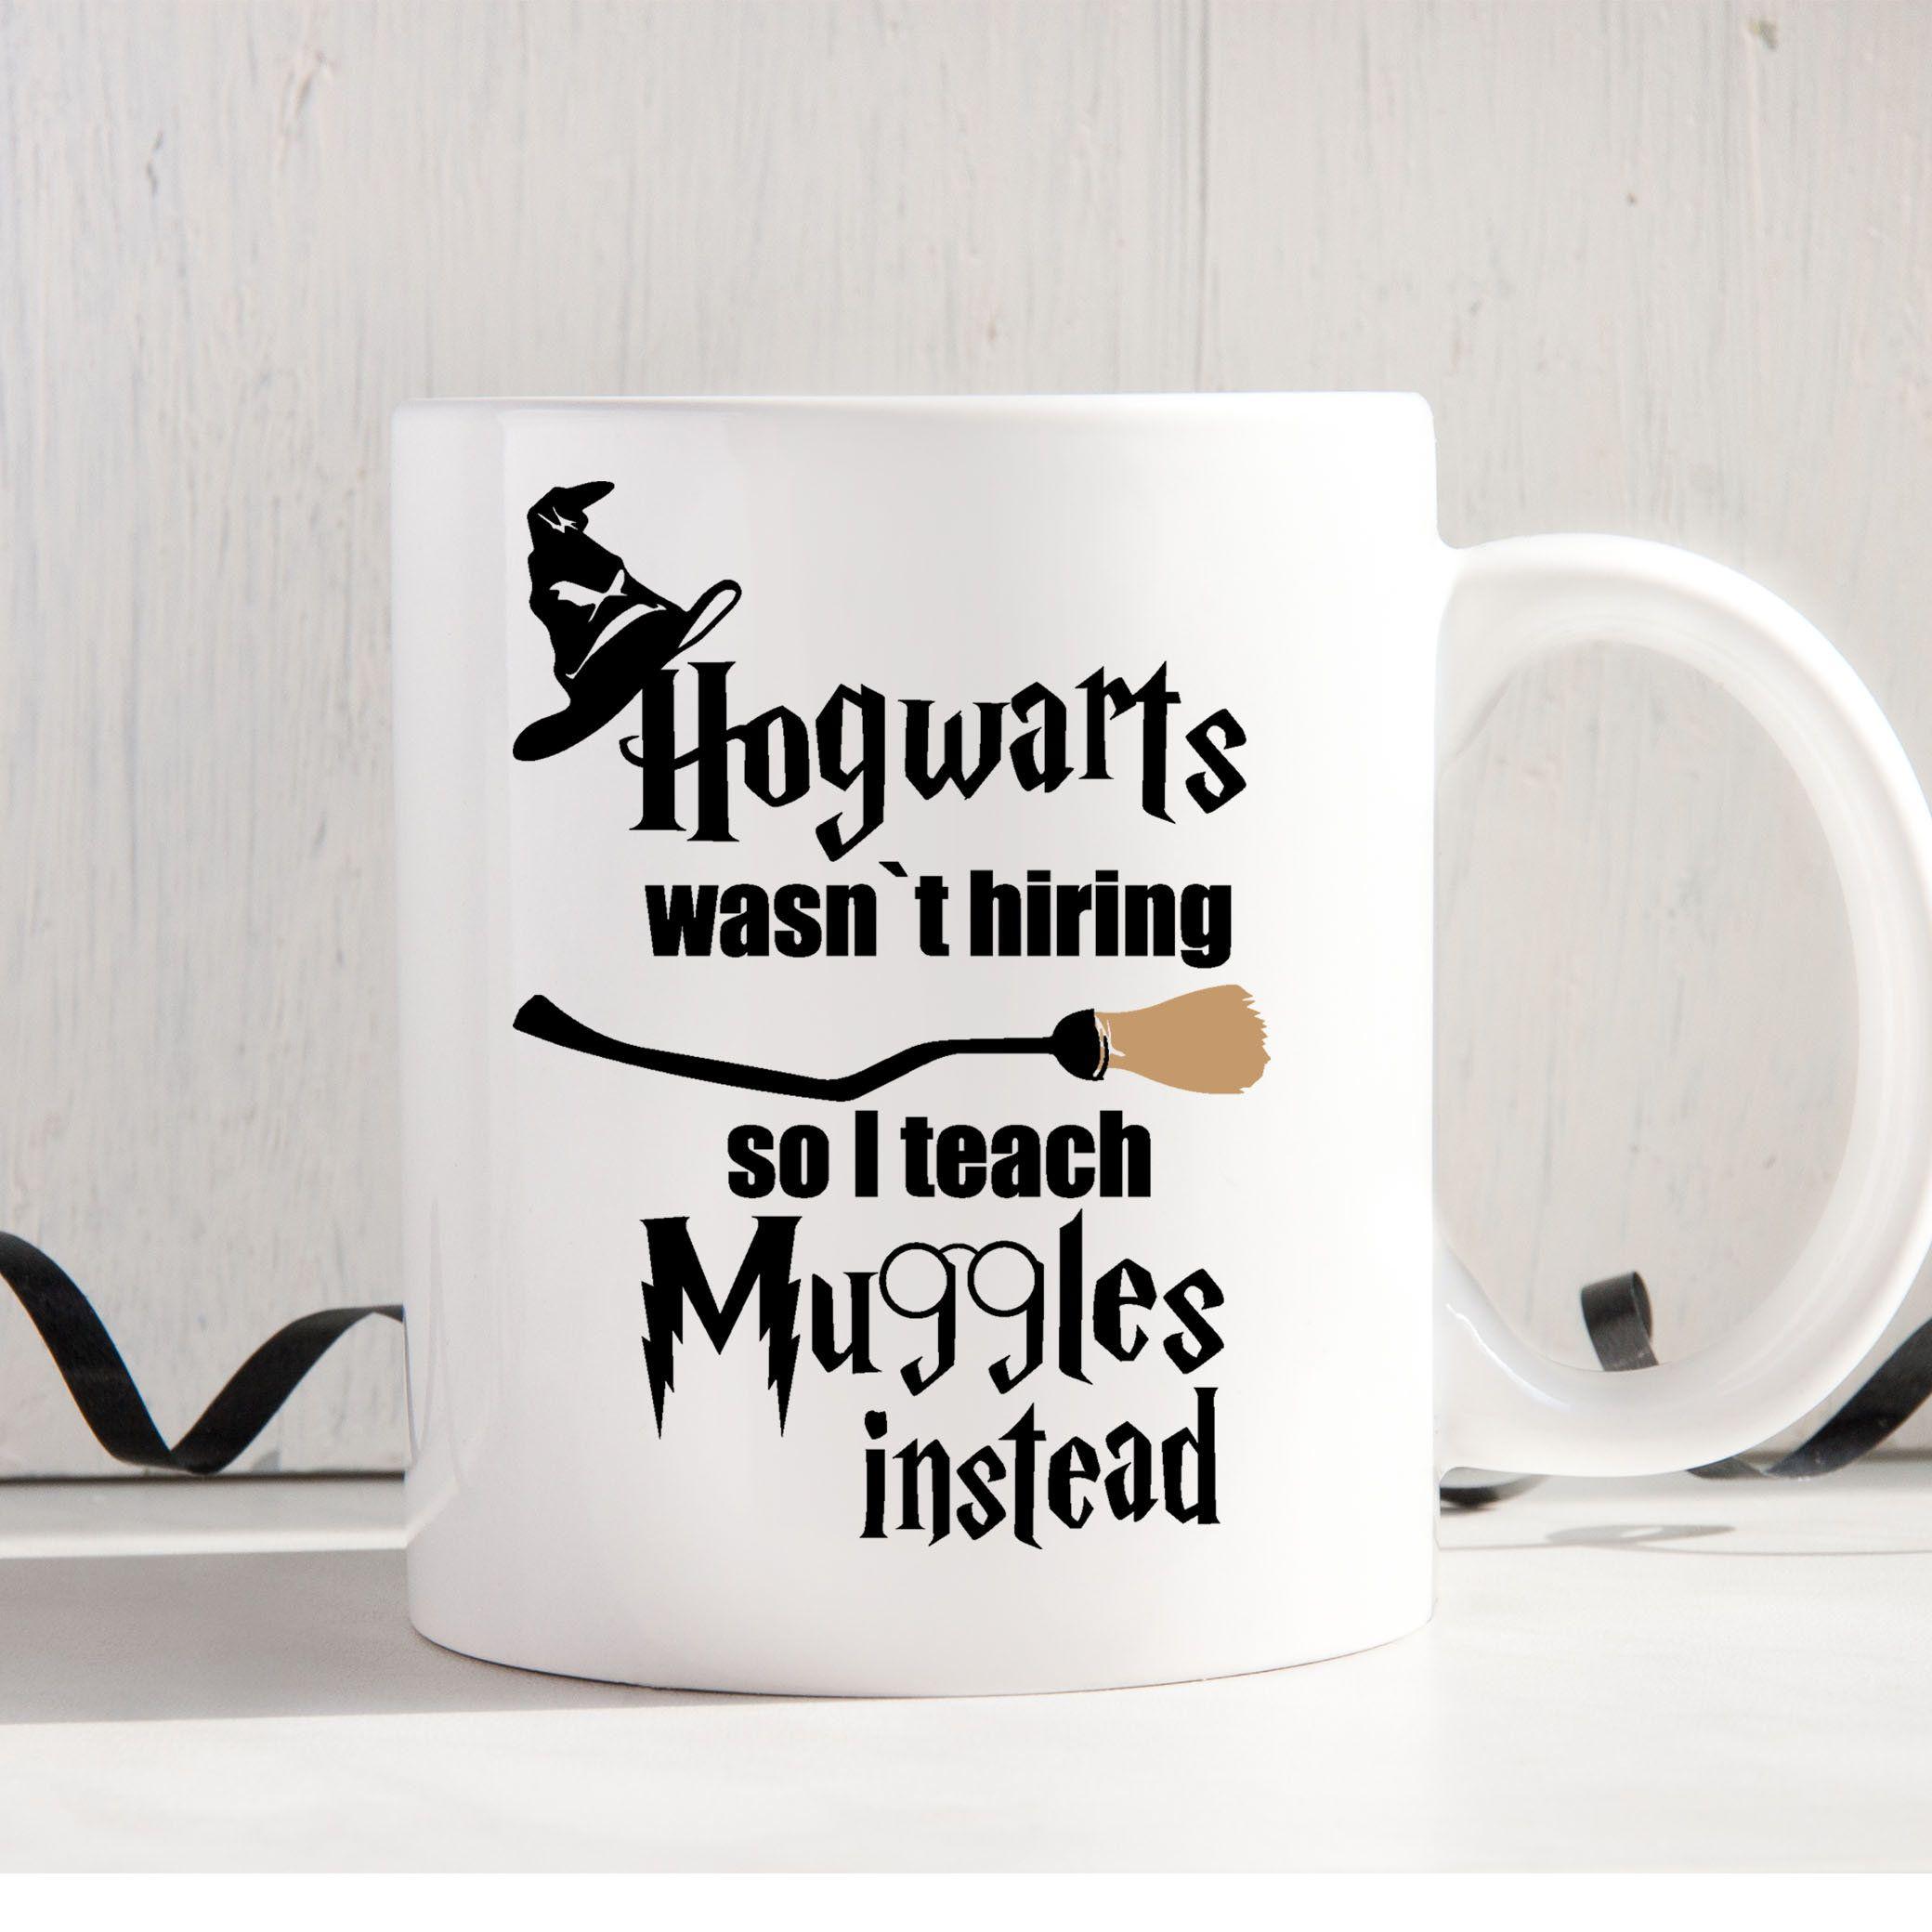 HARRY POTTER TEACHER CUP I TEACH MUGGLES BECAUSE HOGWARTS WASNT HIRING MUG GIFT